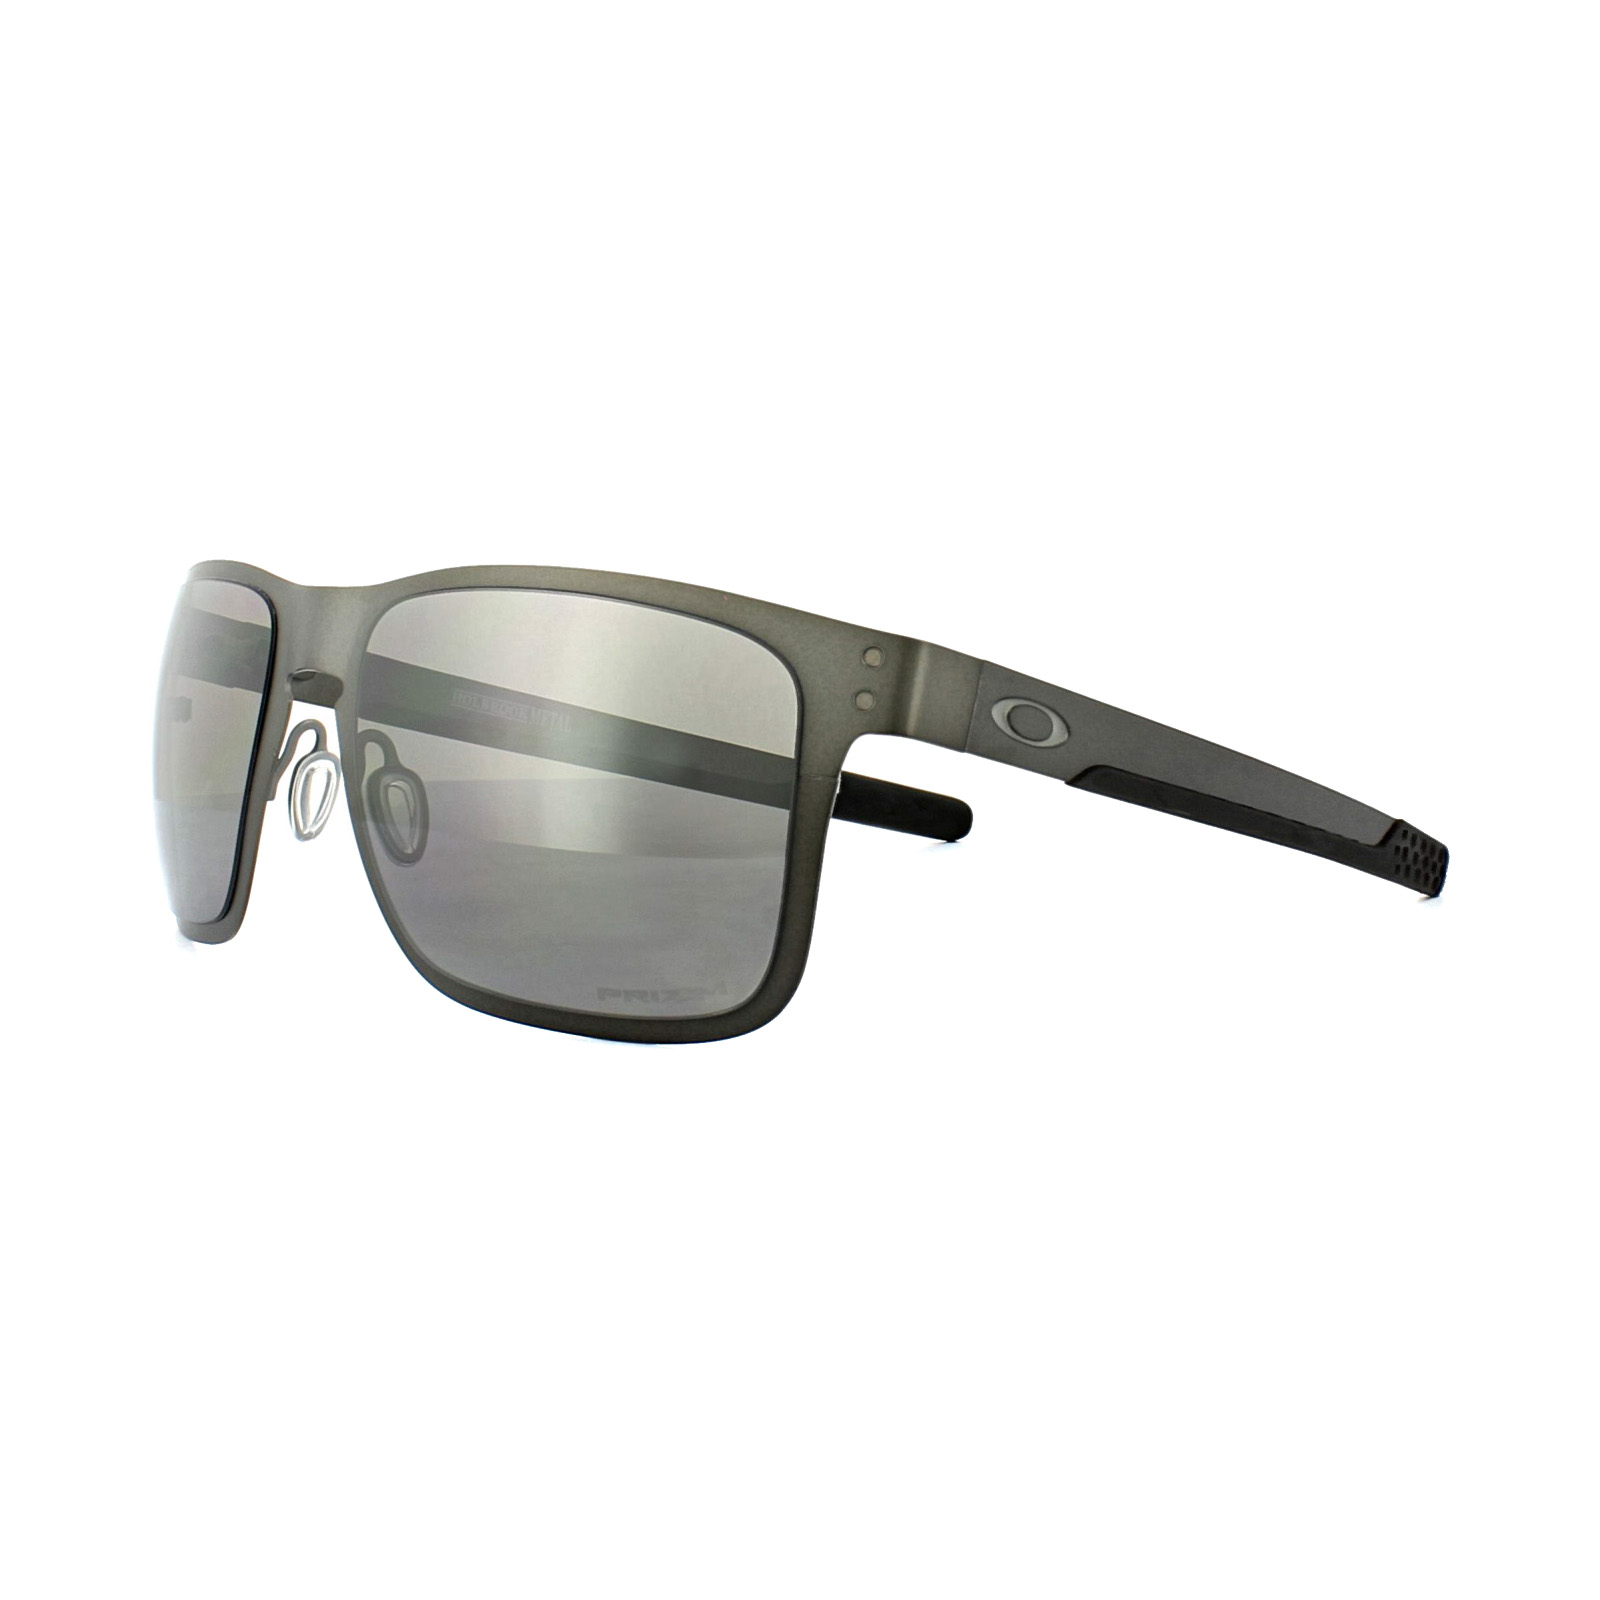 a04b6d934b Cheap Oakley Holbrook Metal Sunglasses - Discounted Sunglasses